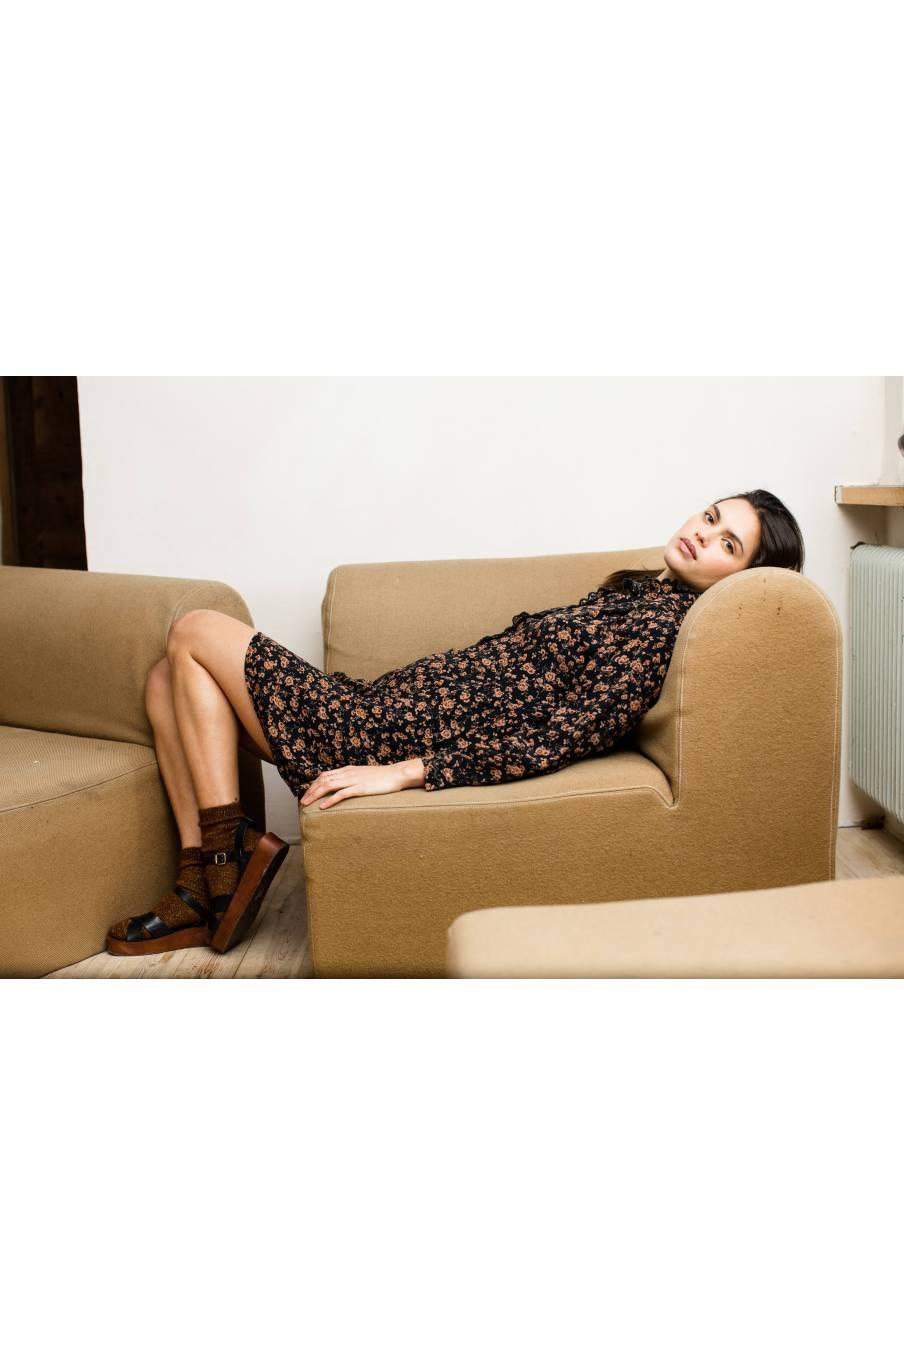 boheme chic vintage chaussettes femme piria chataigne